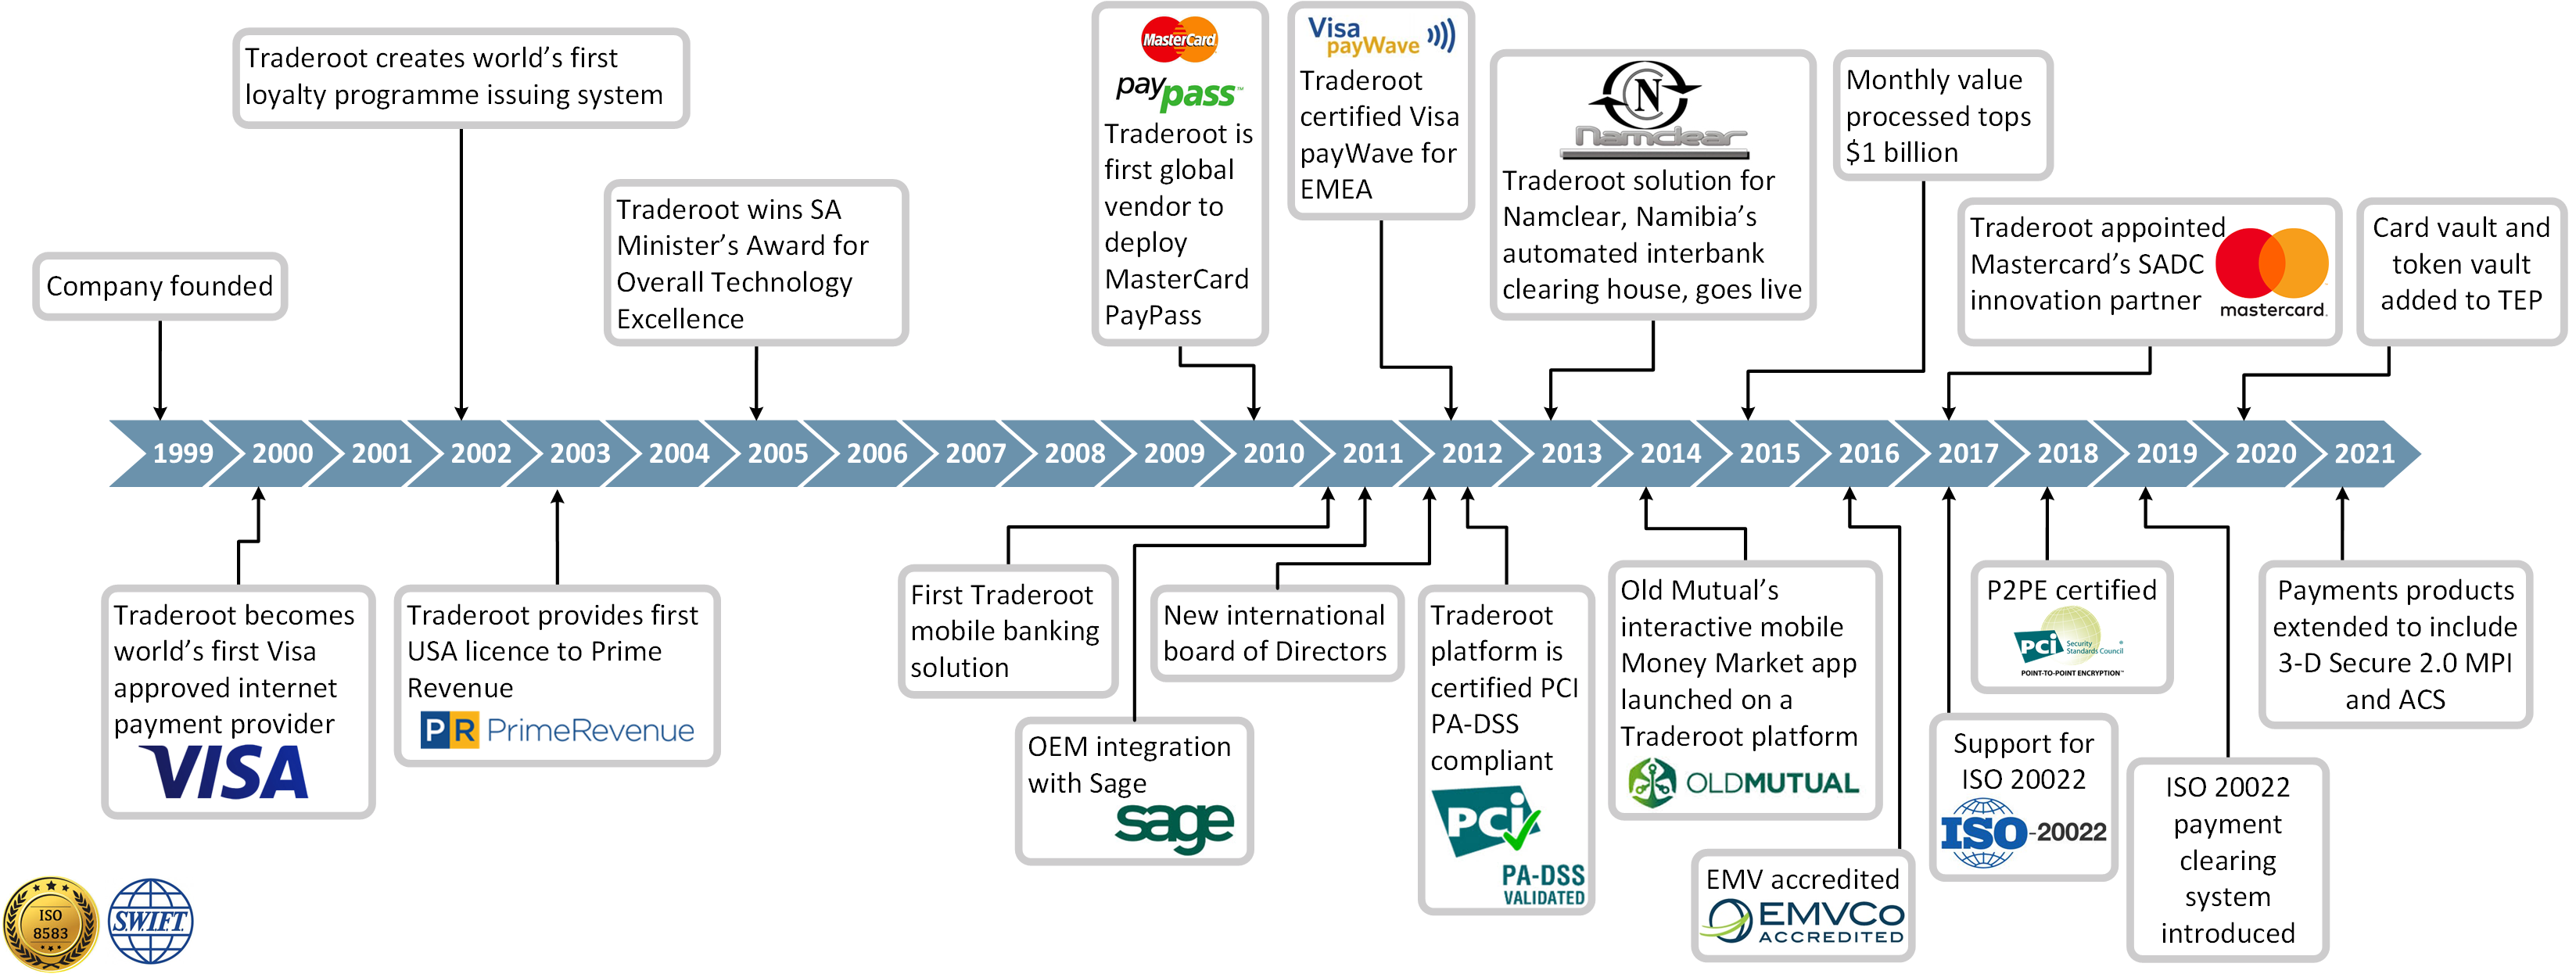 Traderoot Timeline